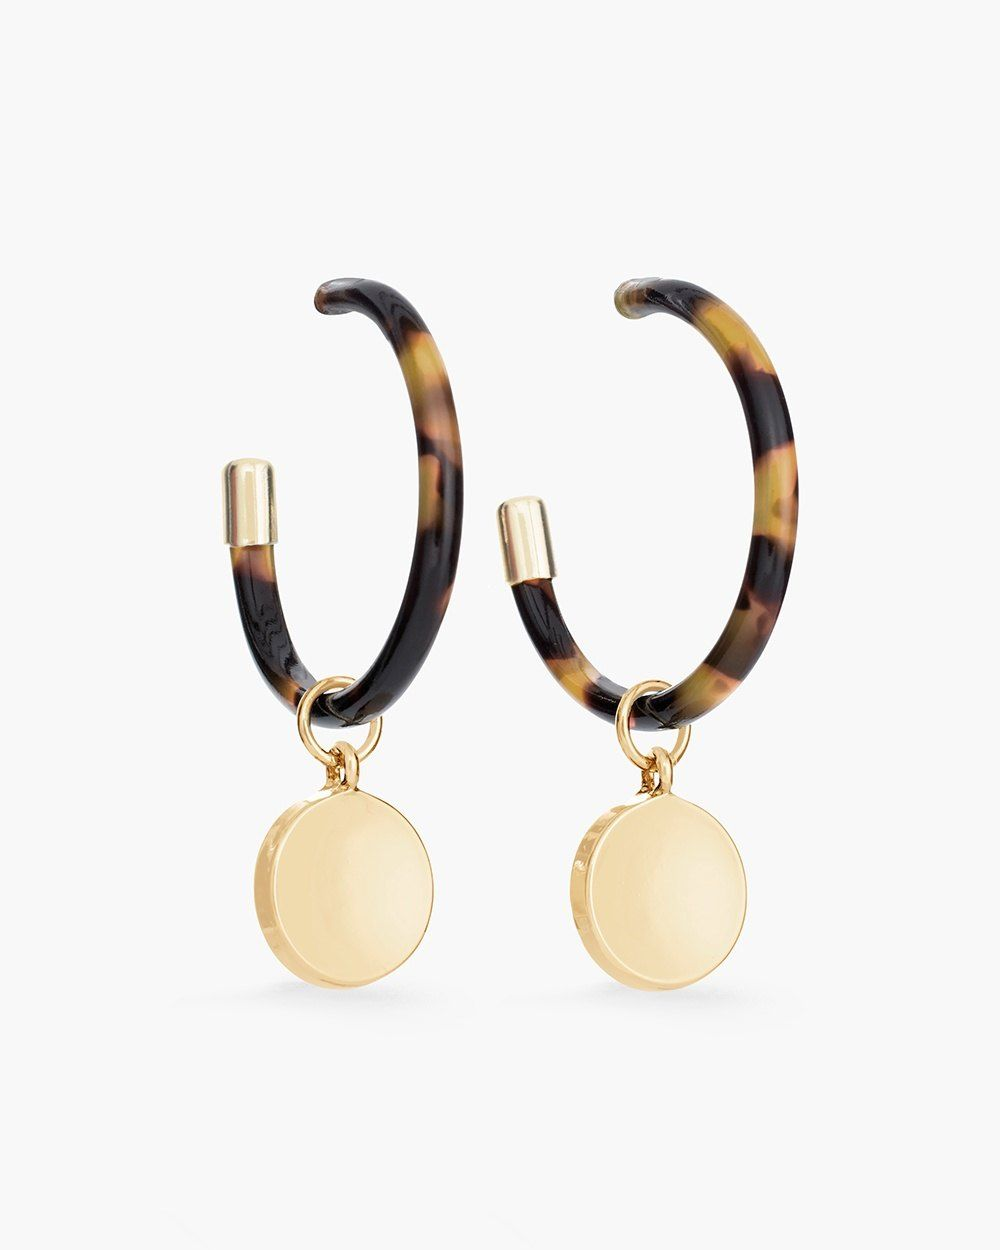 Chico S Mollie Hoop Earrings Aros Cafe Chicas